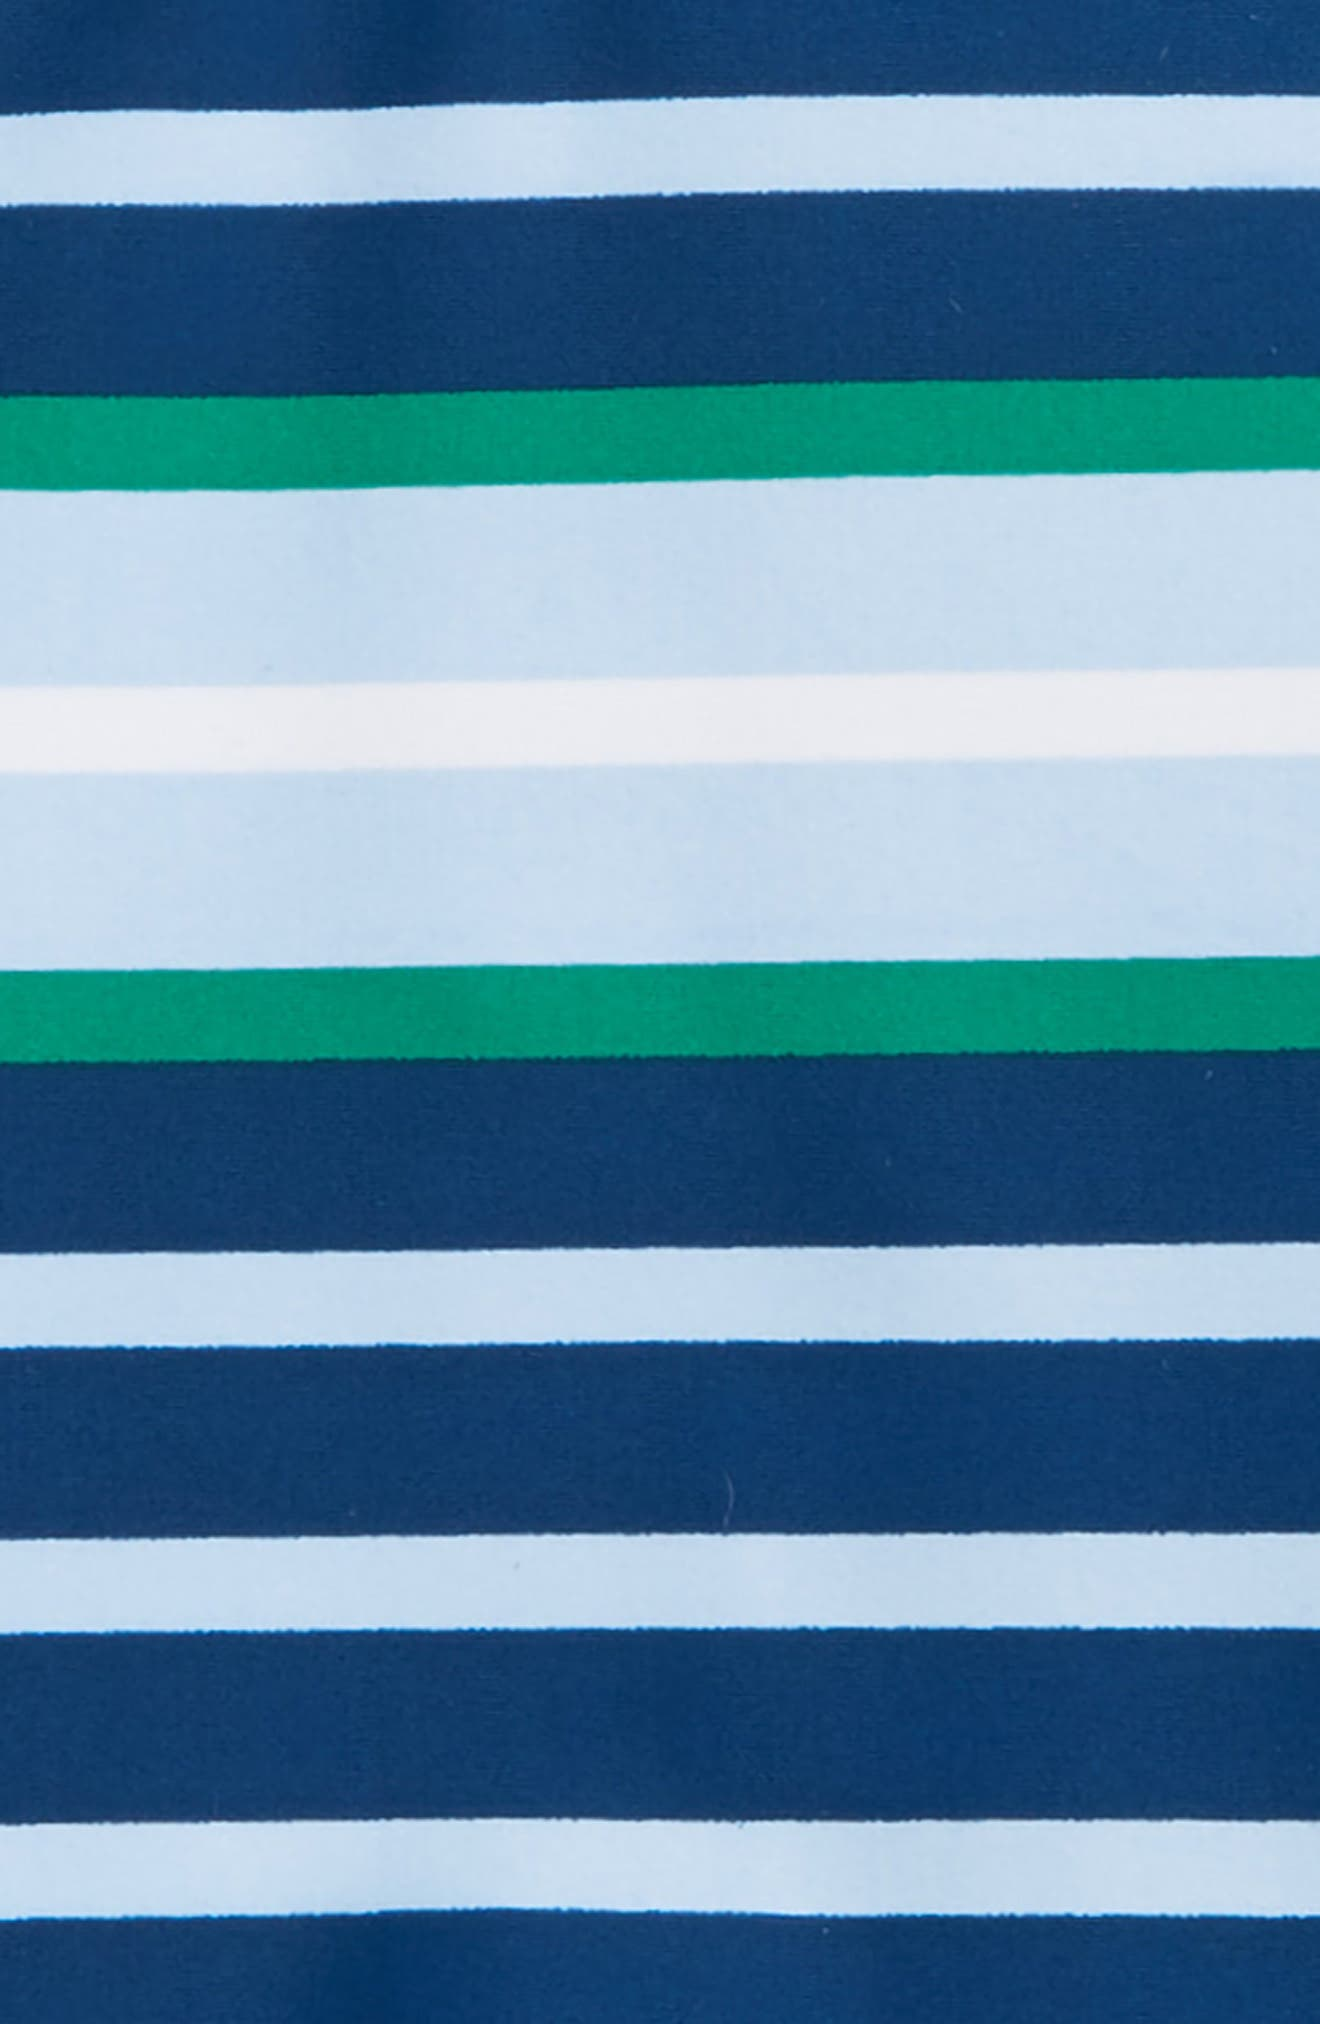 Botanical Blue Two-Piece Rashguard Swimsuit,                             Alternate thumbnail 2, color,                             400